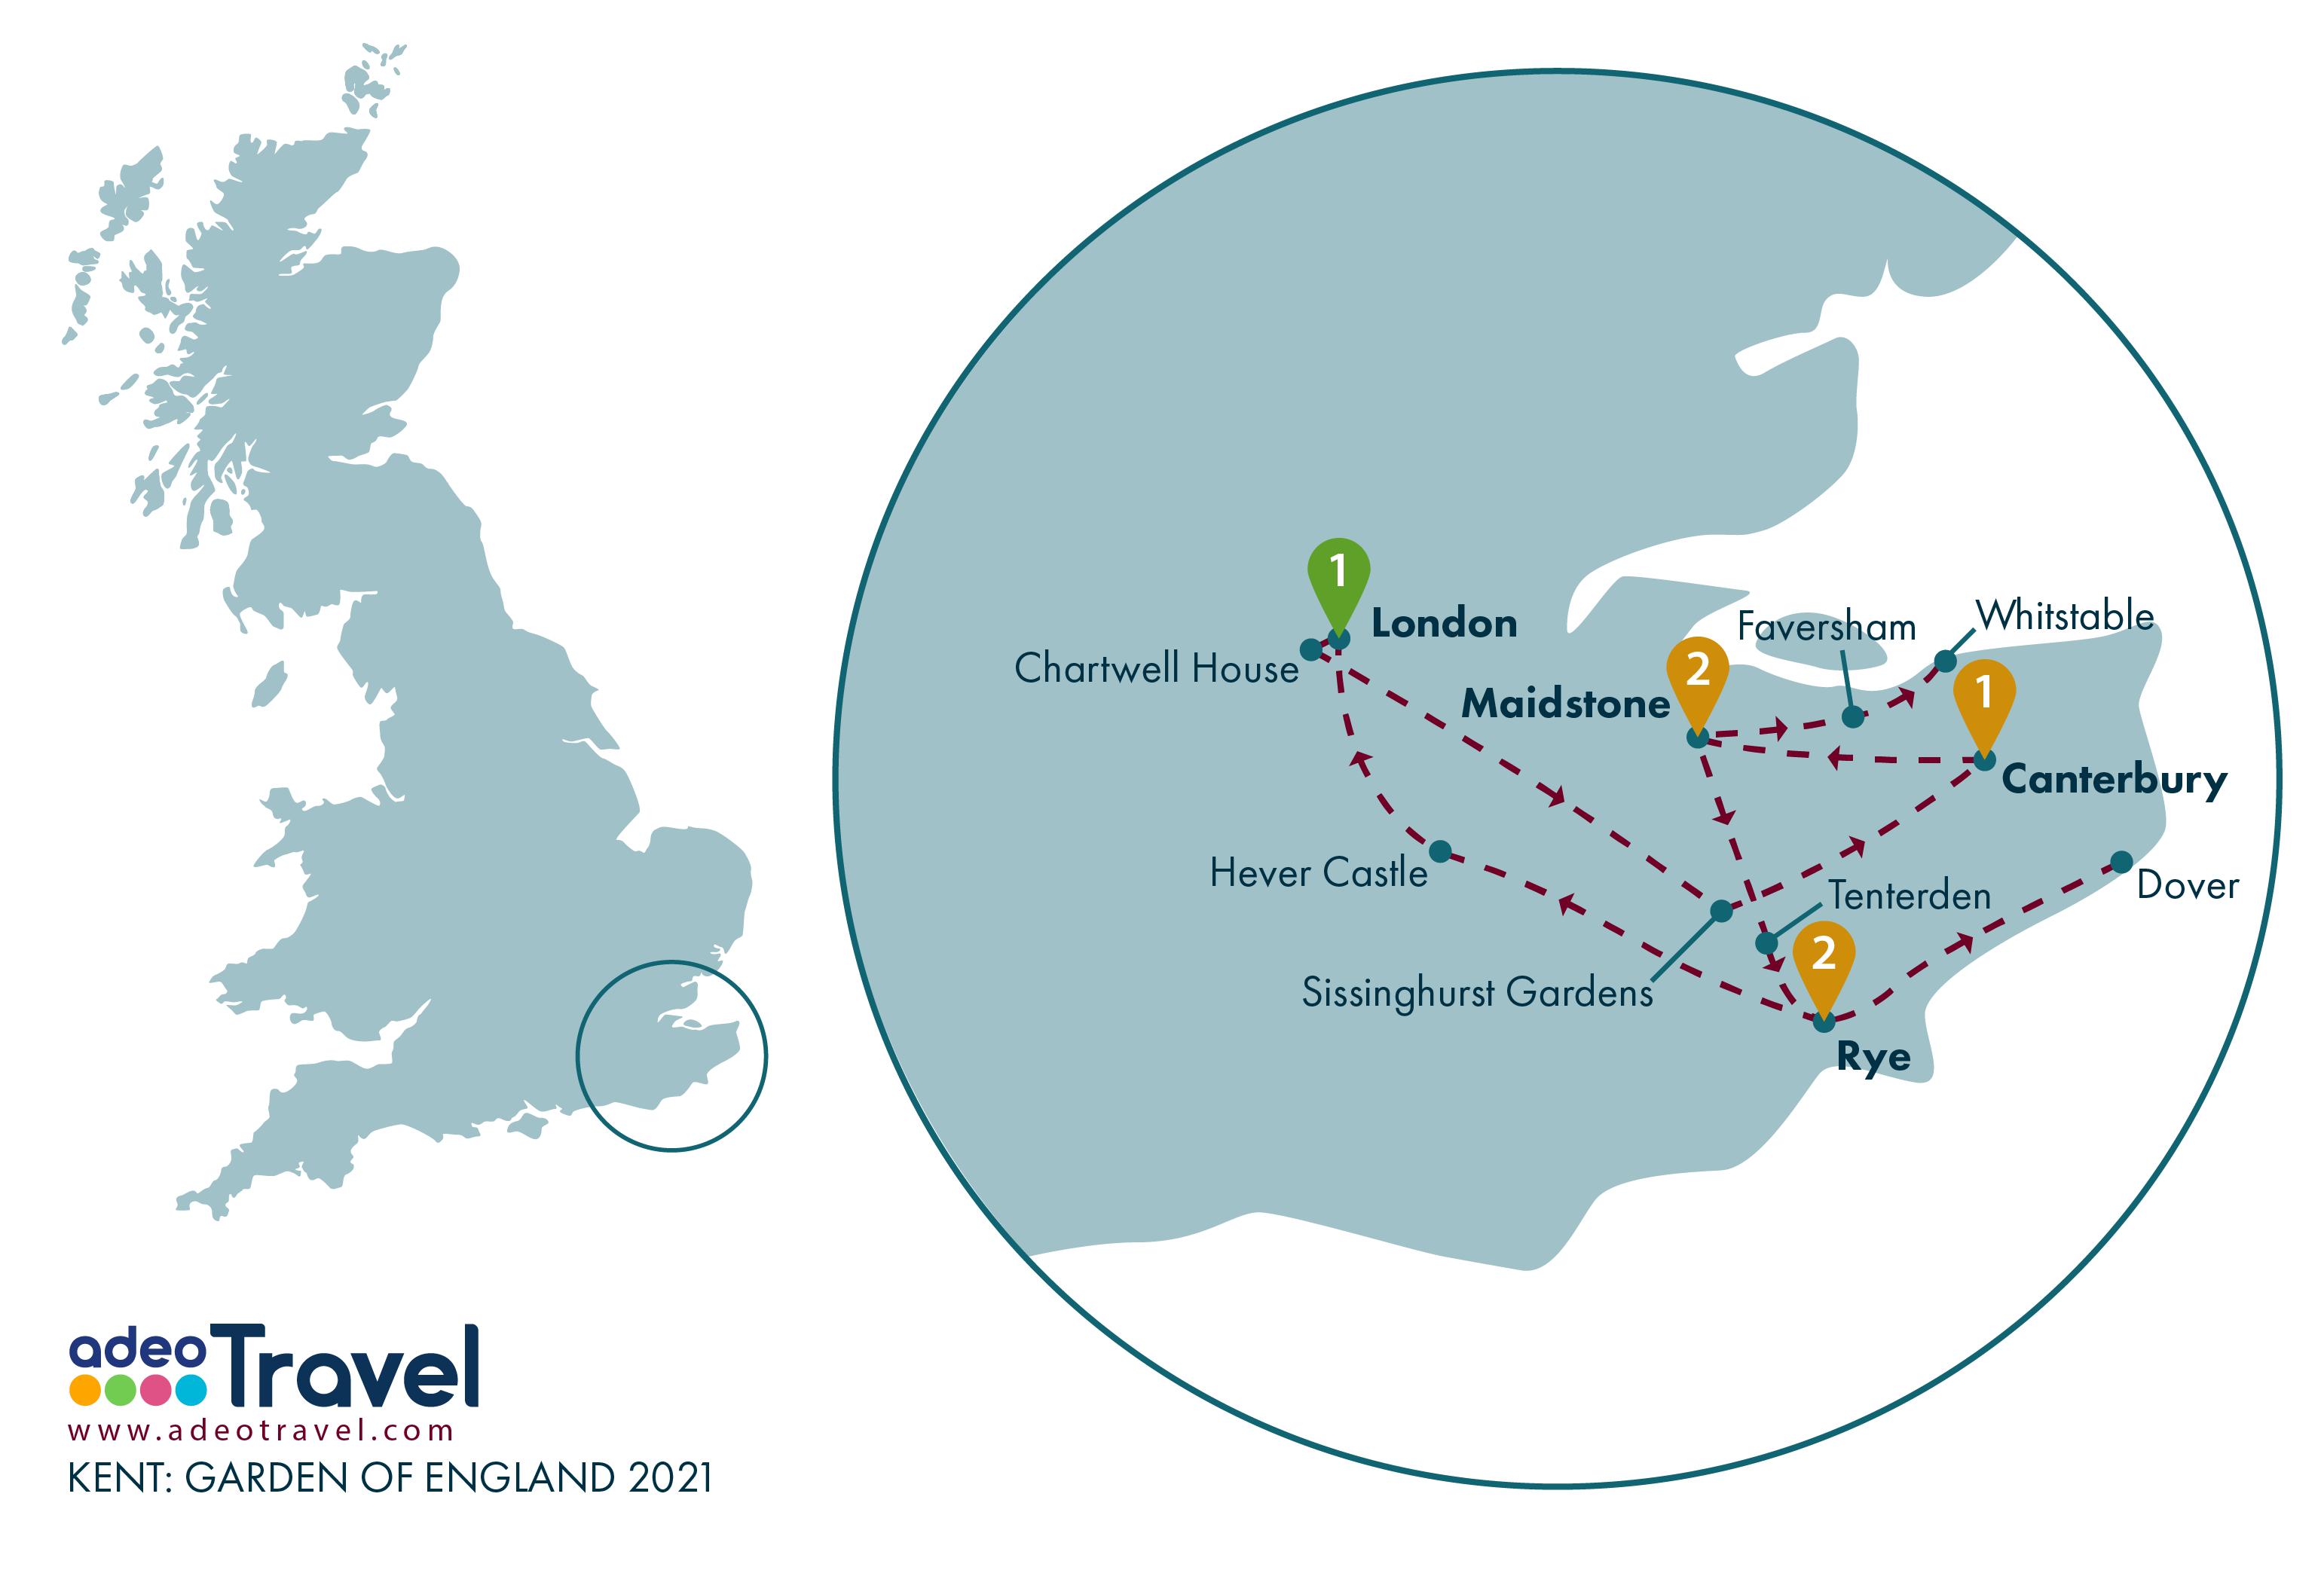 Map - Kent Garden of England 2021